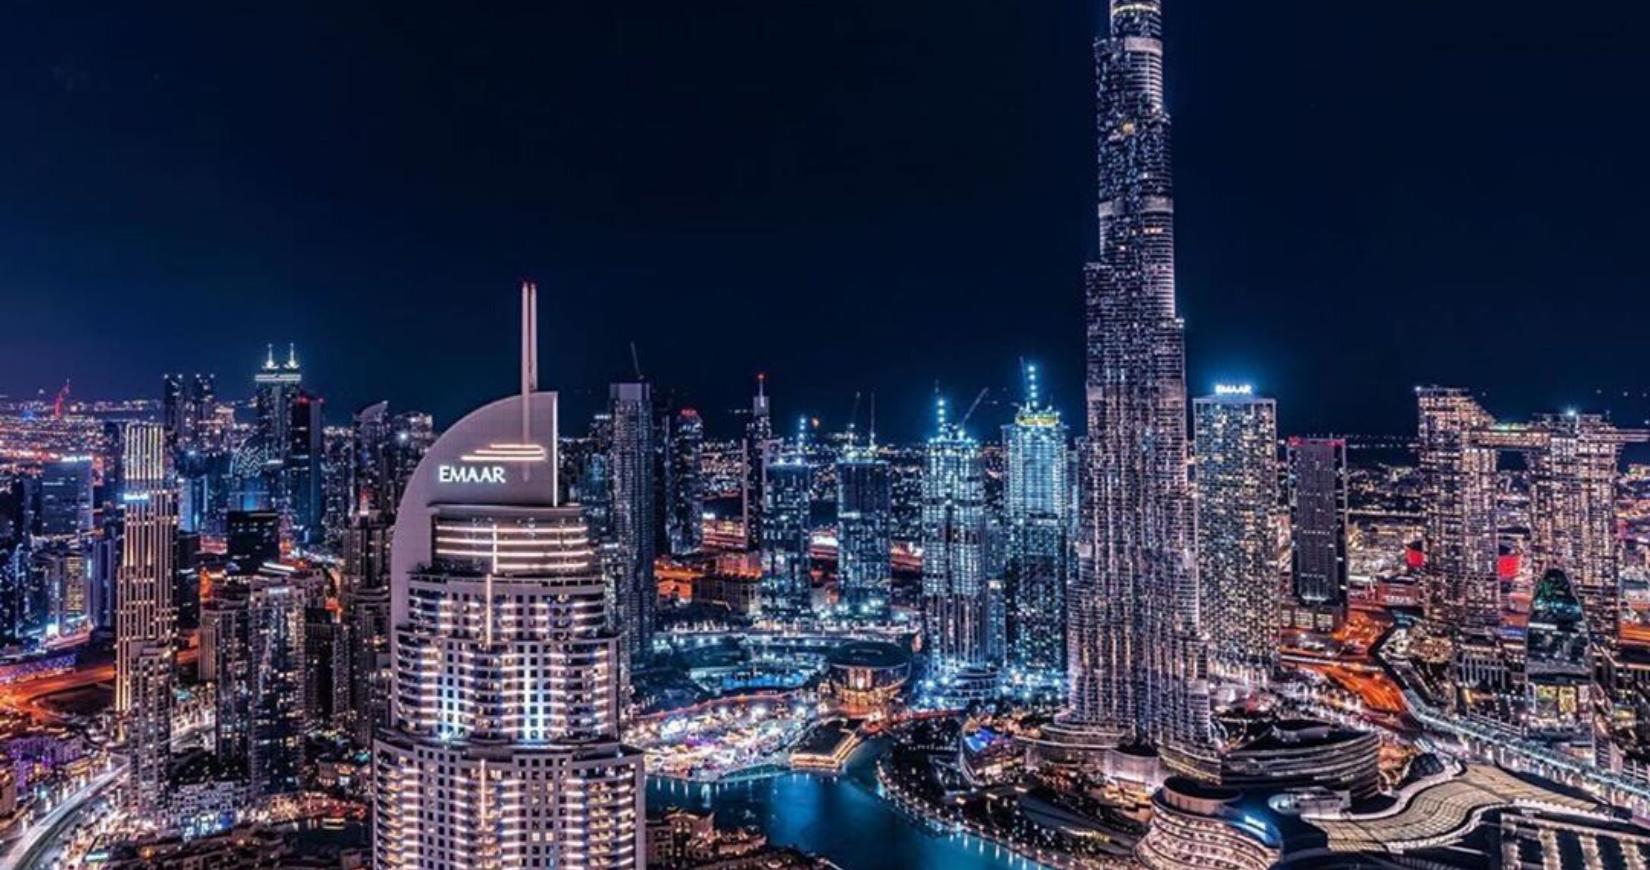 Burj Khalifa Dubai overnight curfews uae